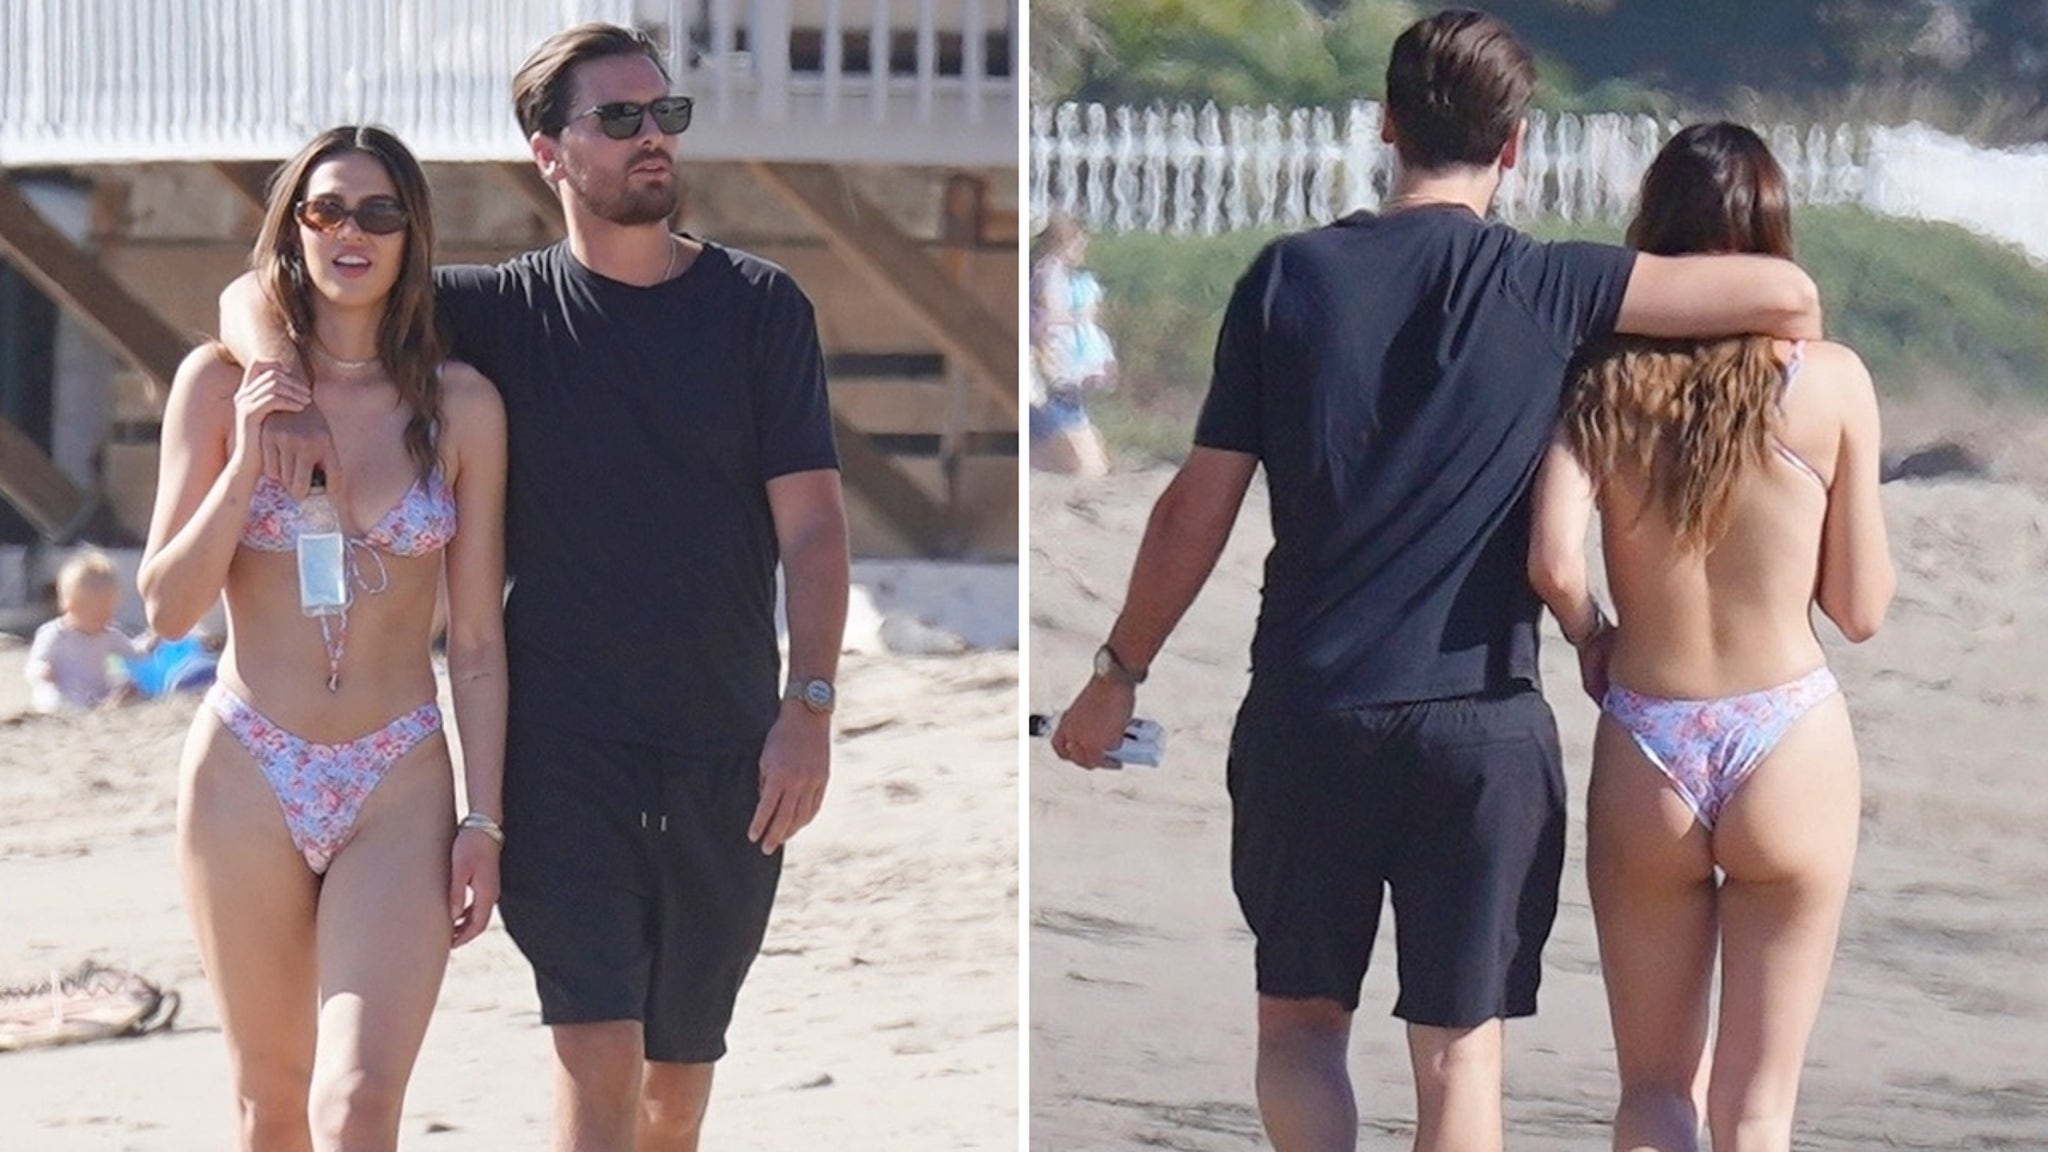 Scott Disick Hits the Beach with 19-Year-Old Amelia Hamlin